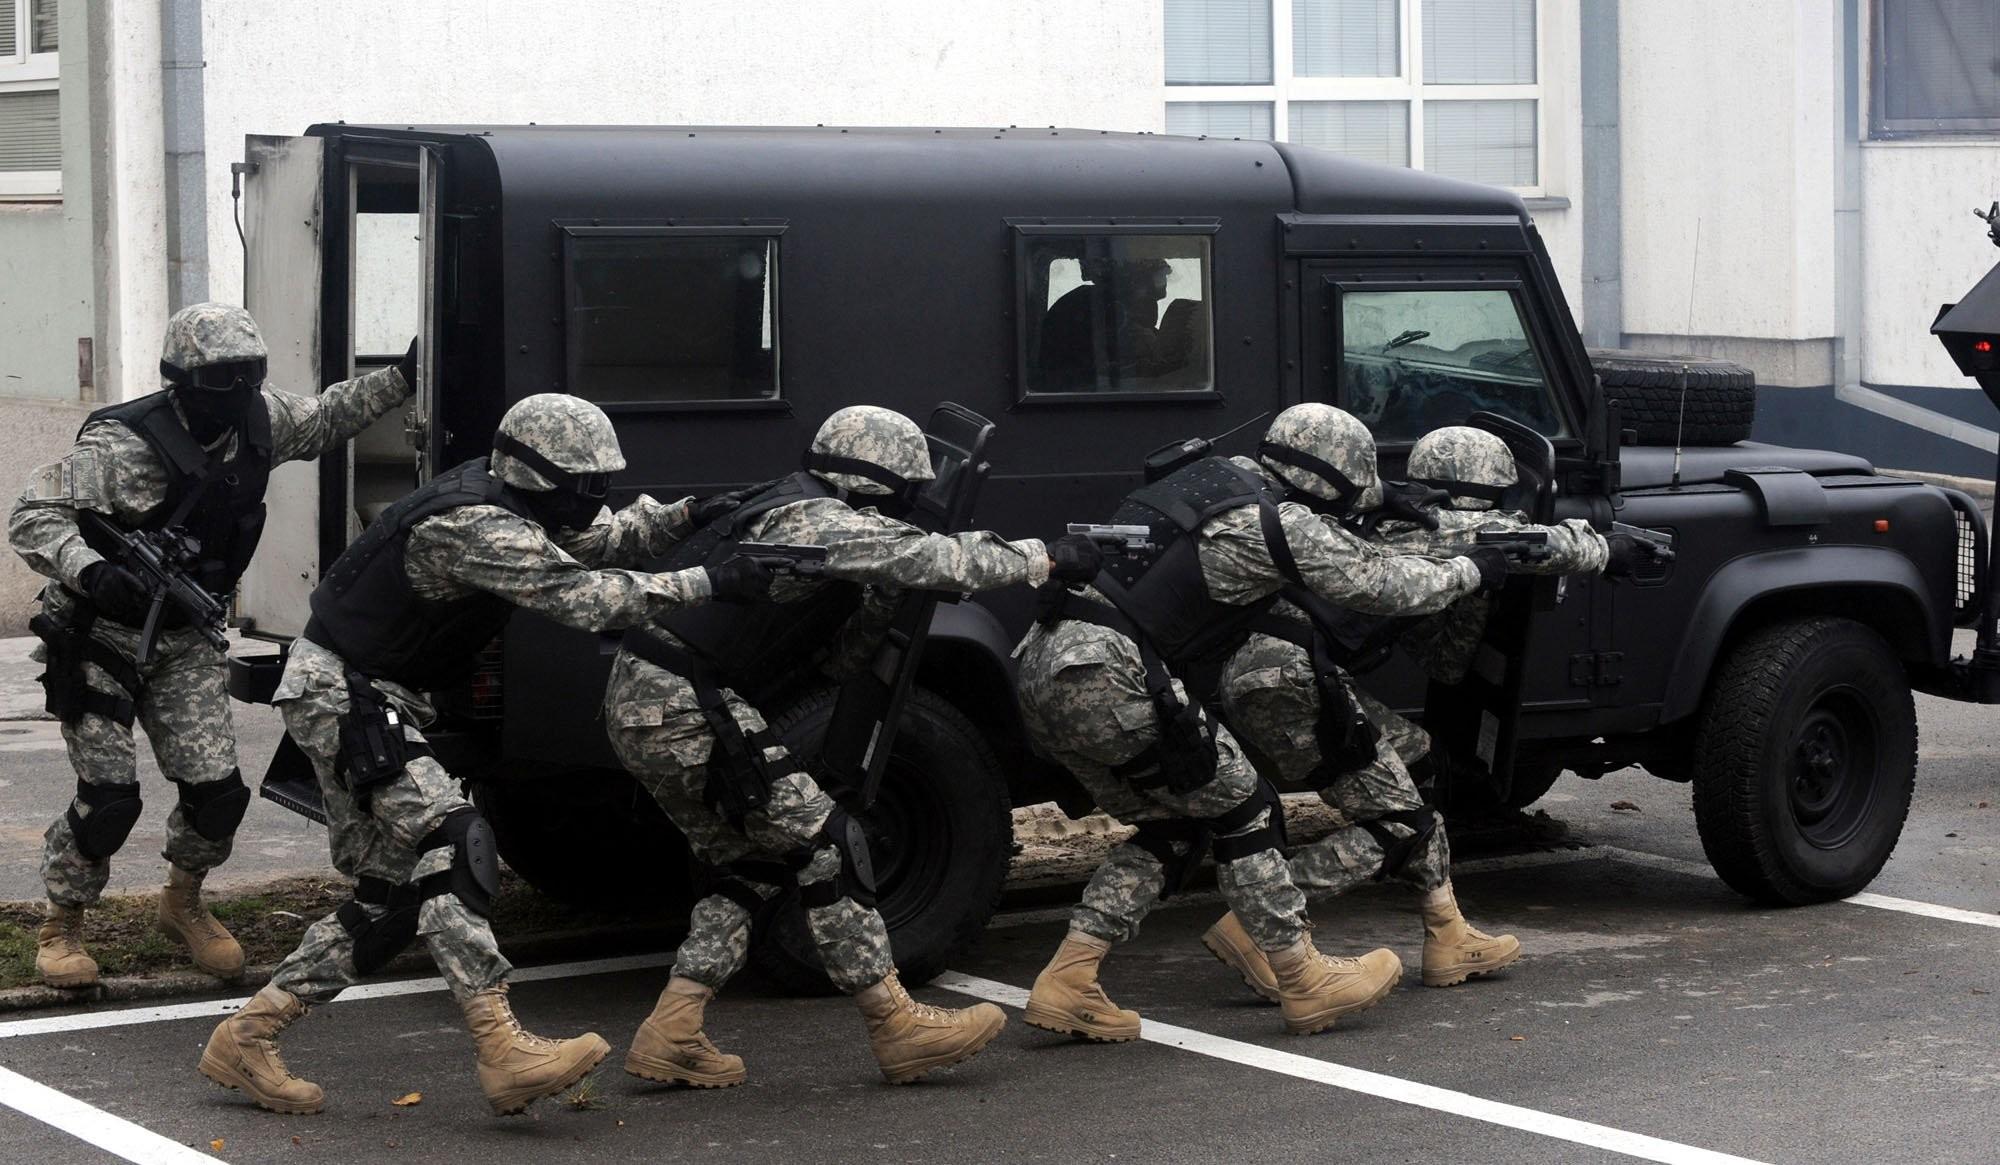 Res: 2000x1165, SWAT TEAM police crime emergency weapon gun wallpaper |  | 514280  | WallpaperUP